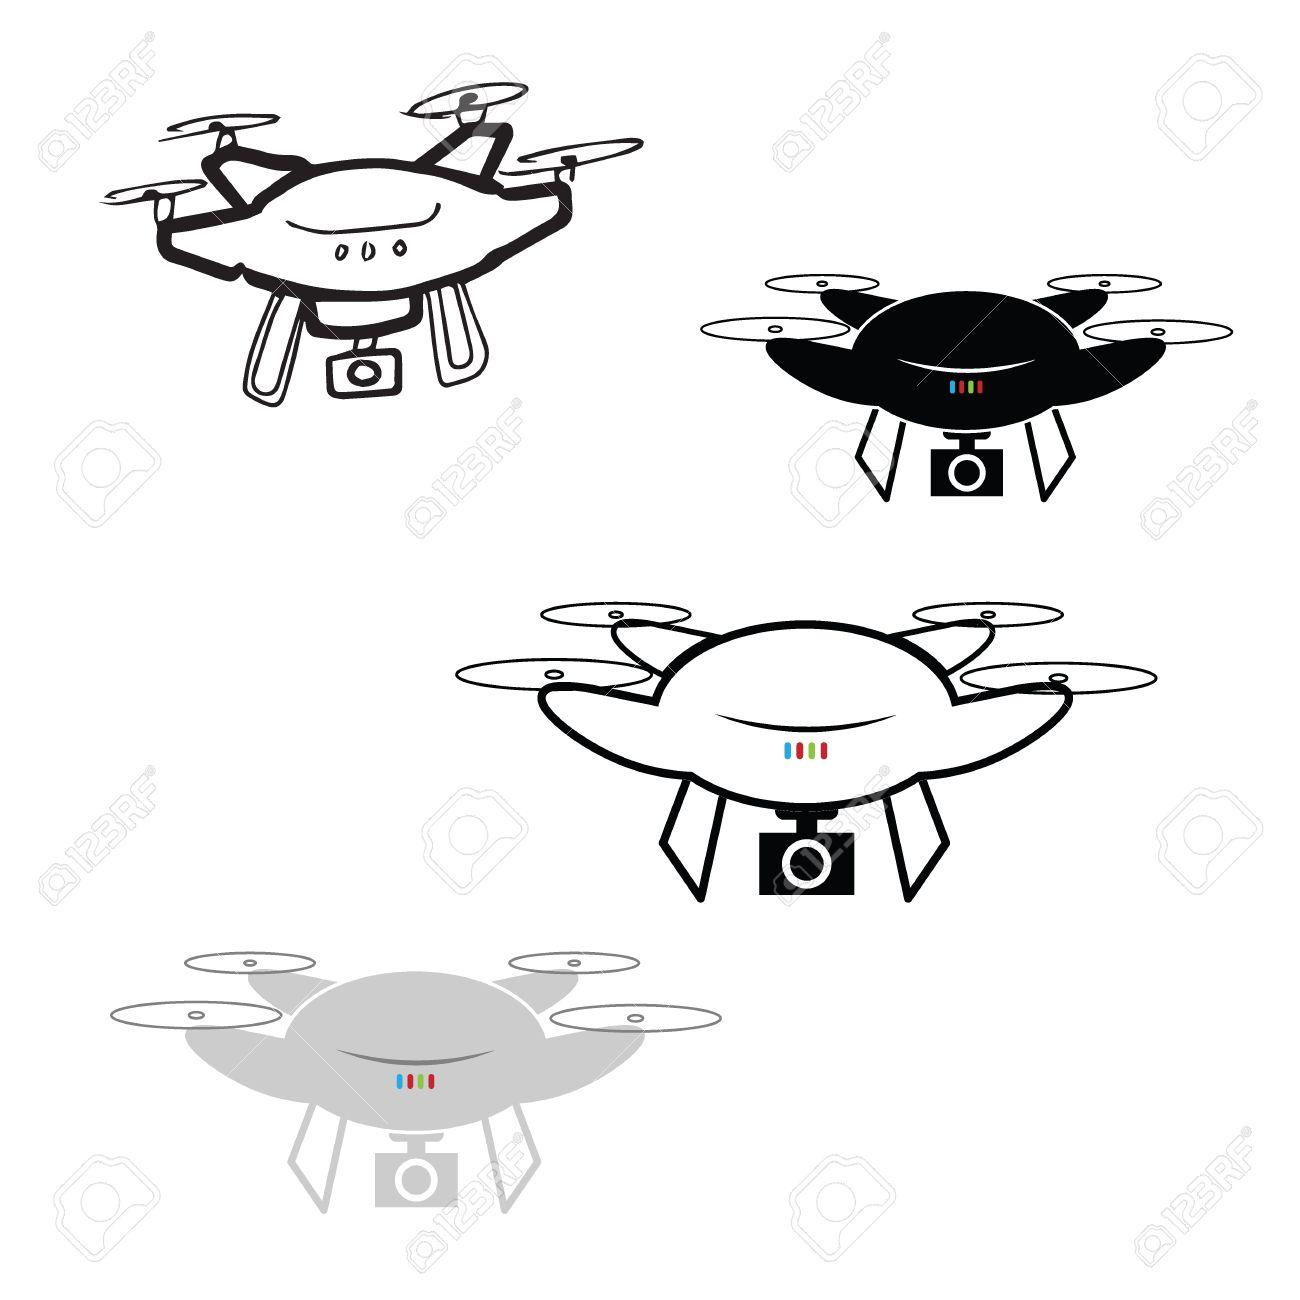 Drone Spy Camera Cartoon Drawing Royalty Free Cliparts Vectors And